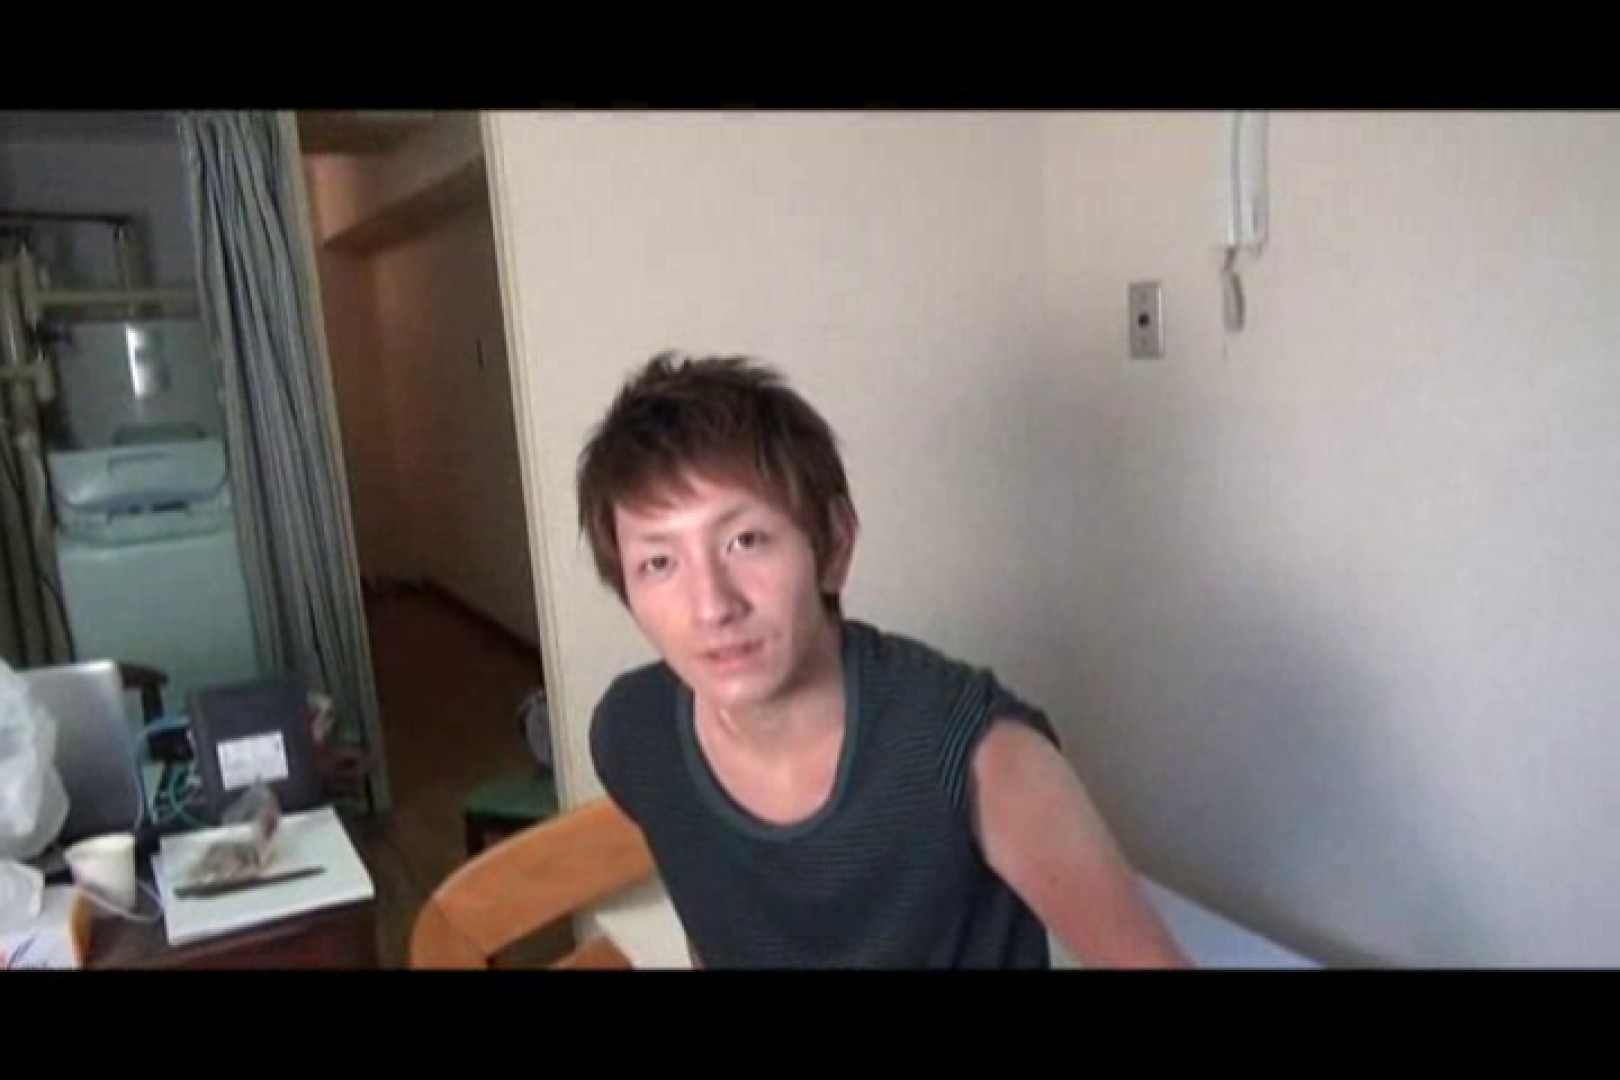 ONA見せカーニバル!! Vol2 モ無し エロビデオ紹介 68枚 27